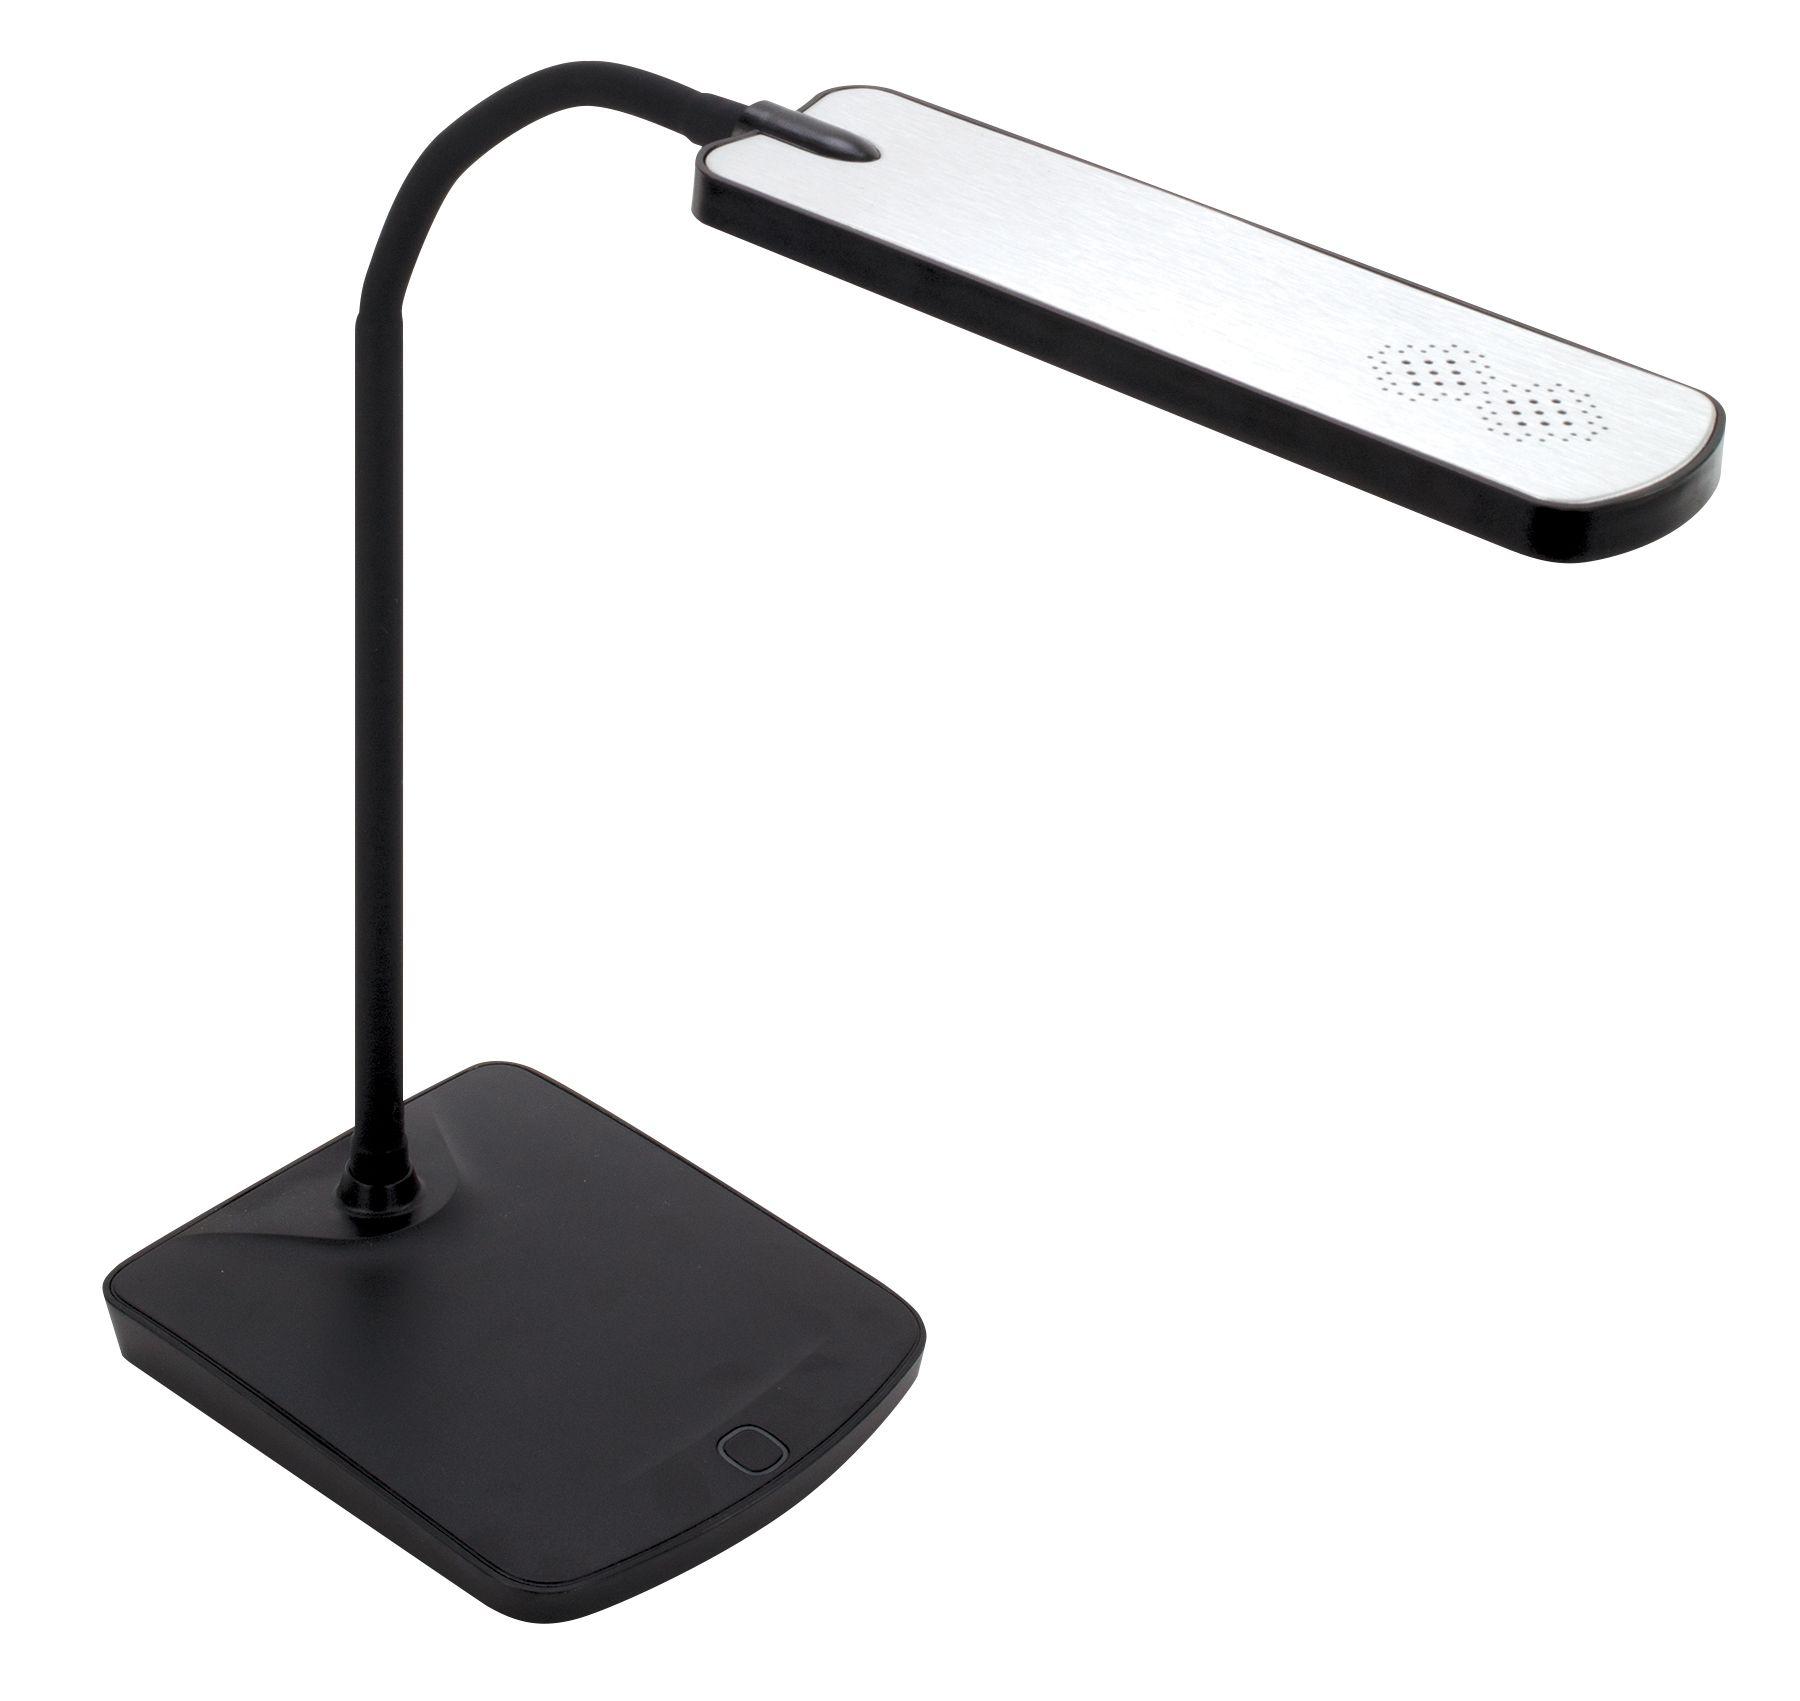 Marbella LED Lamp, Silver